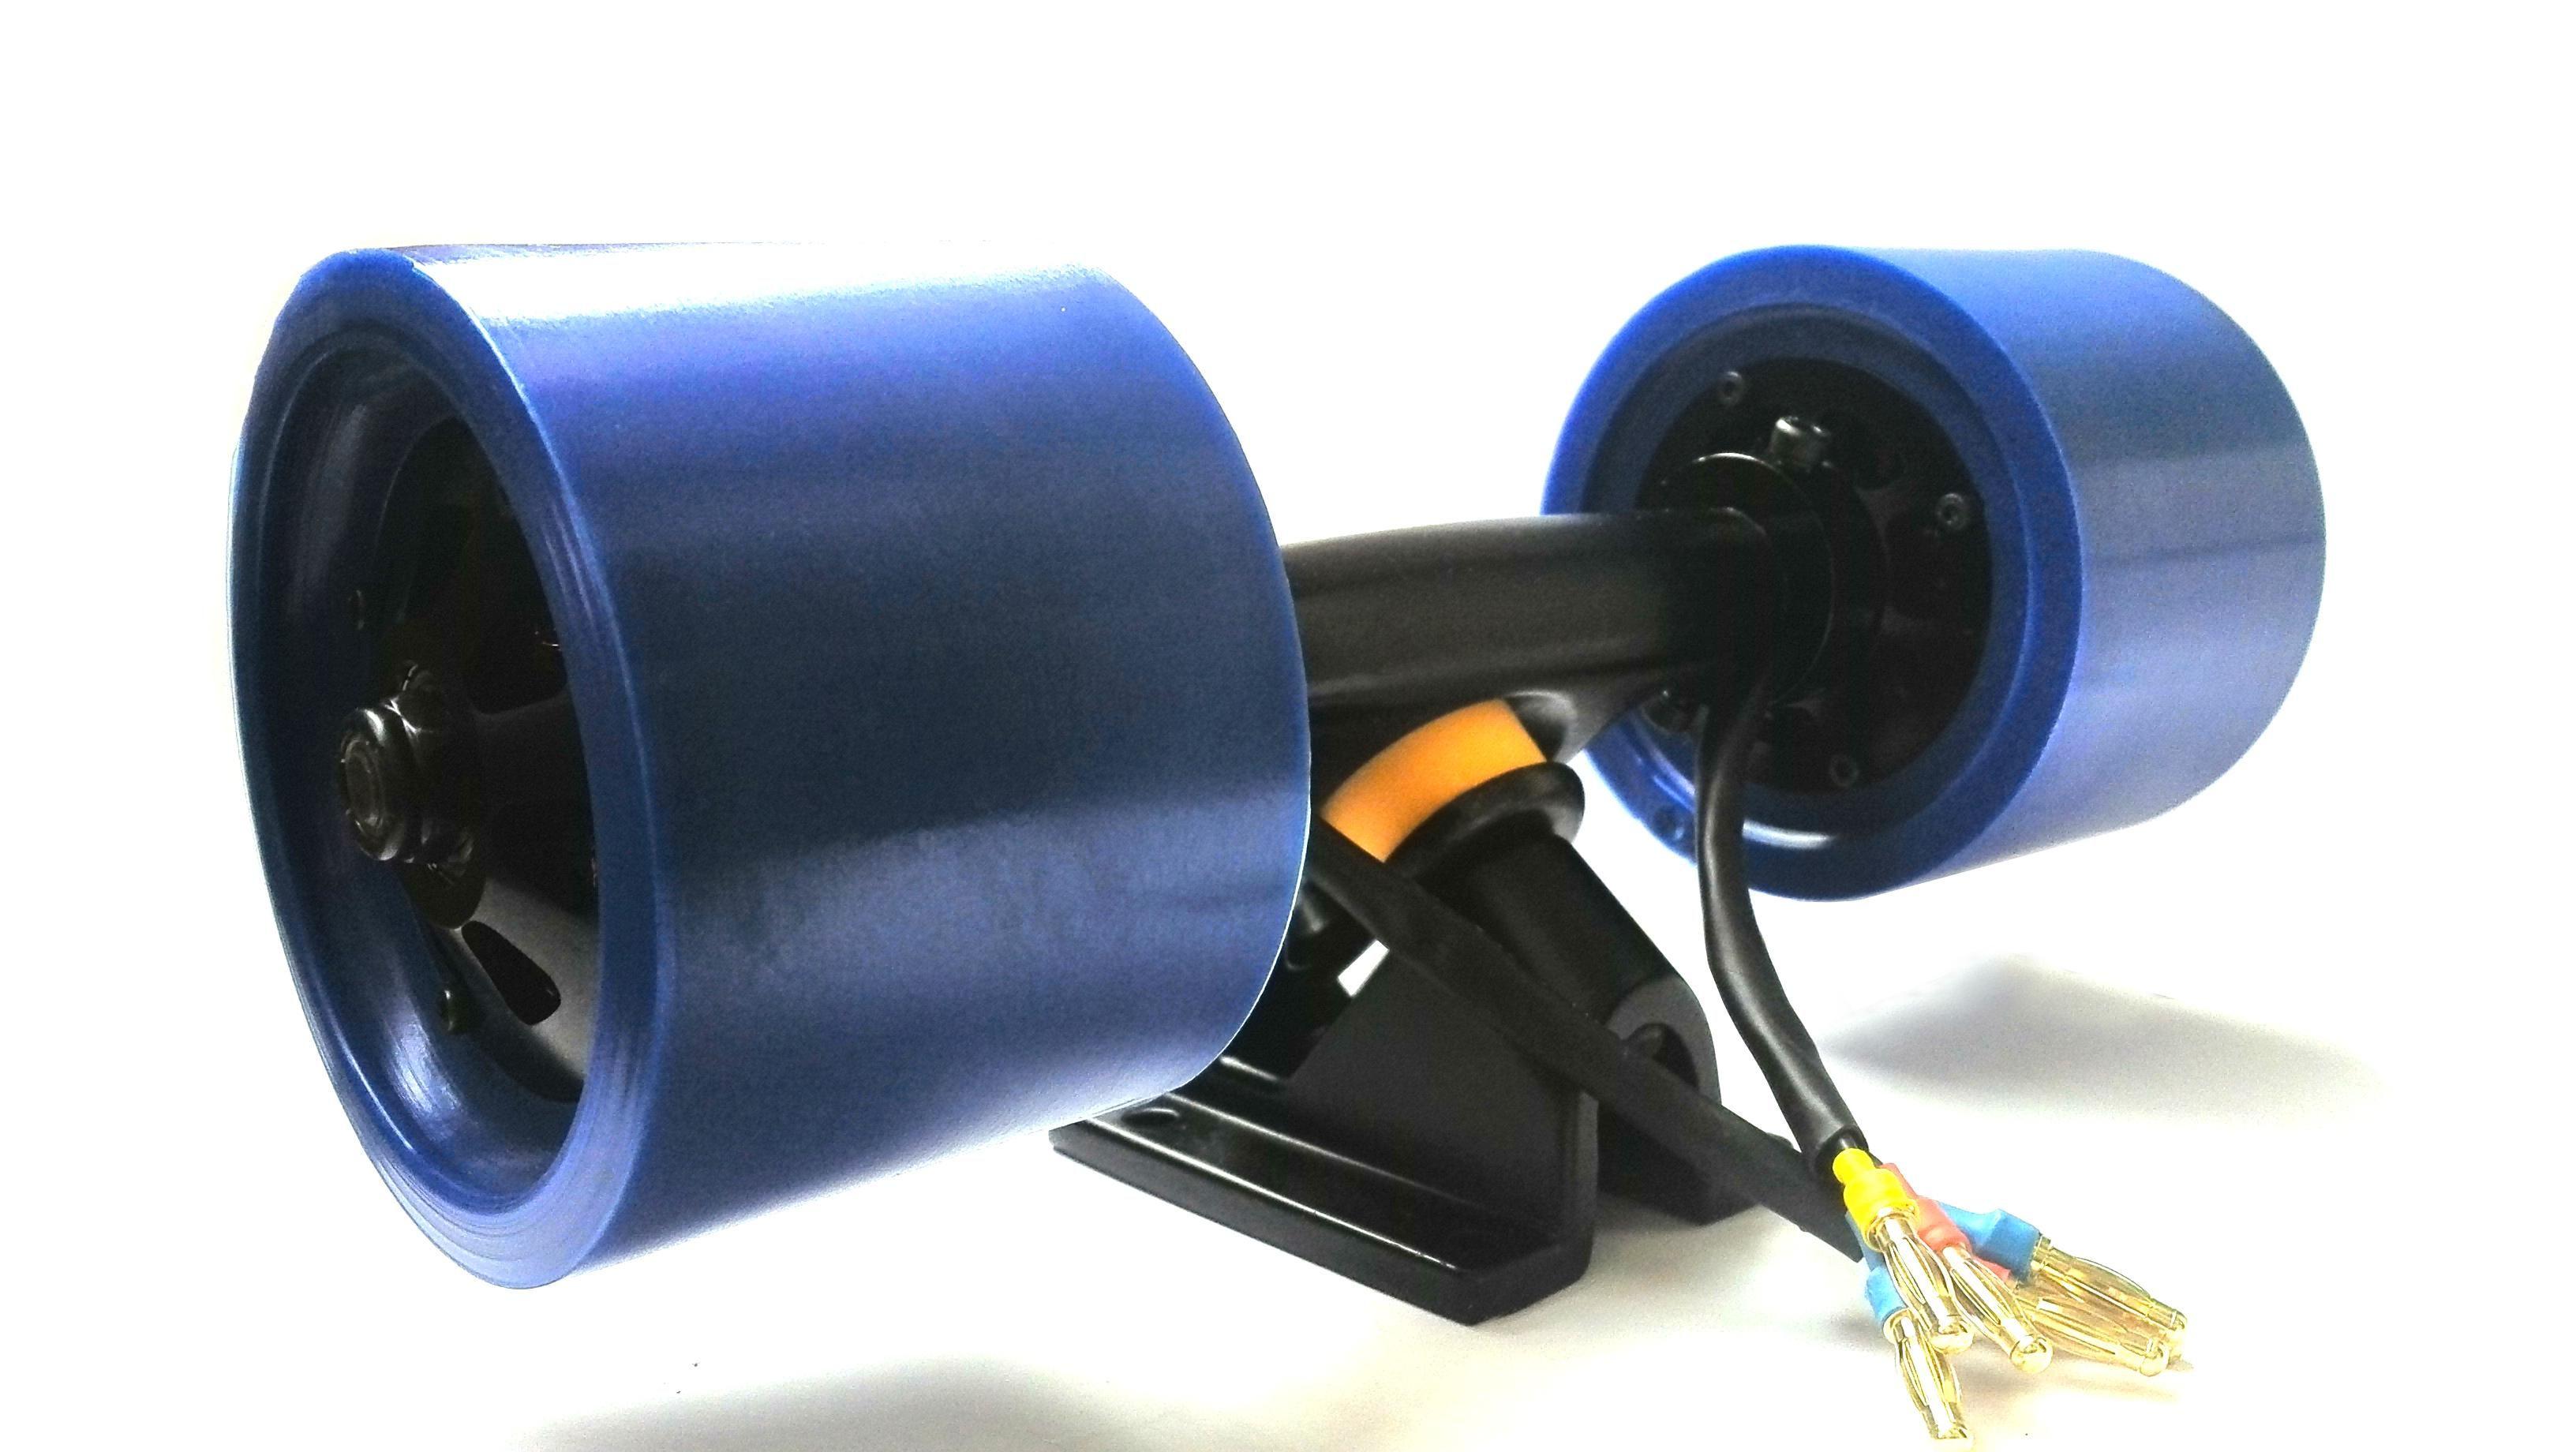 Dual hub motor kit for Electric skateboard longboard for DIY  Skateboards motor  Electric